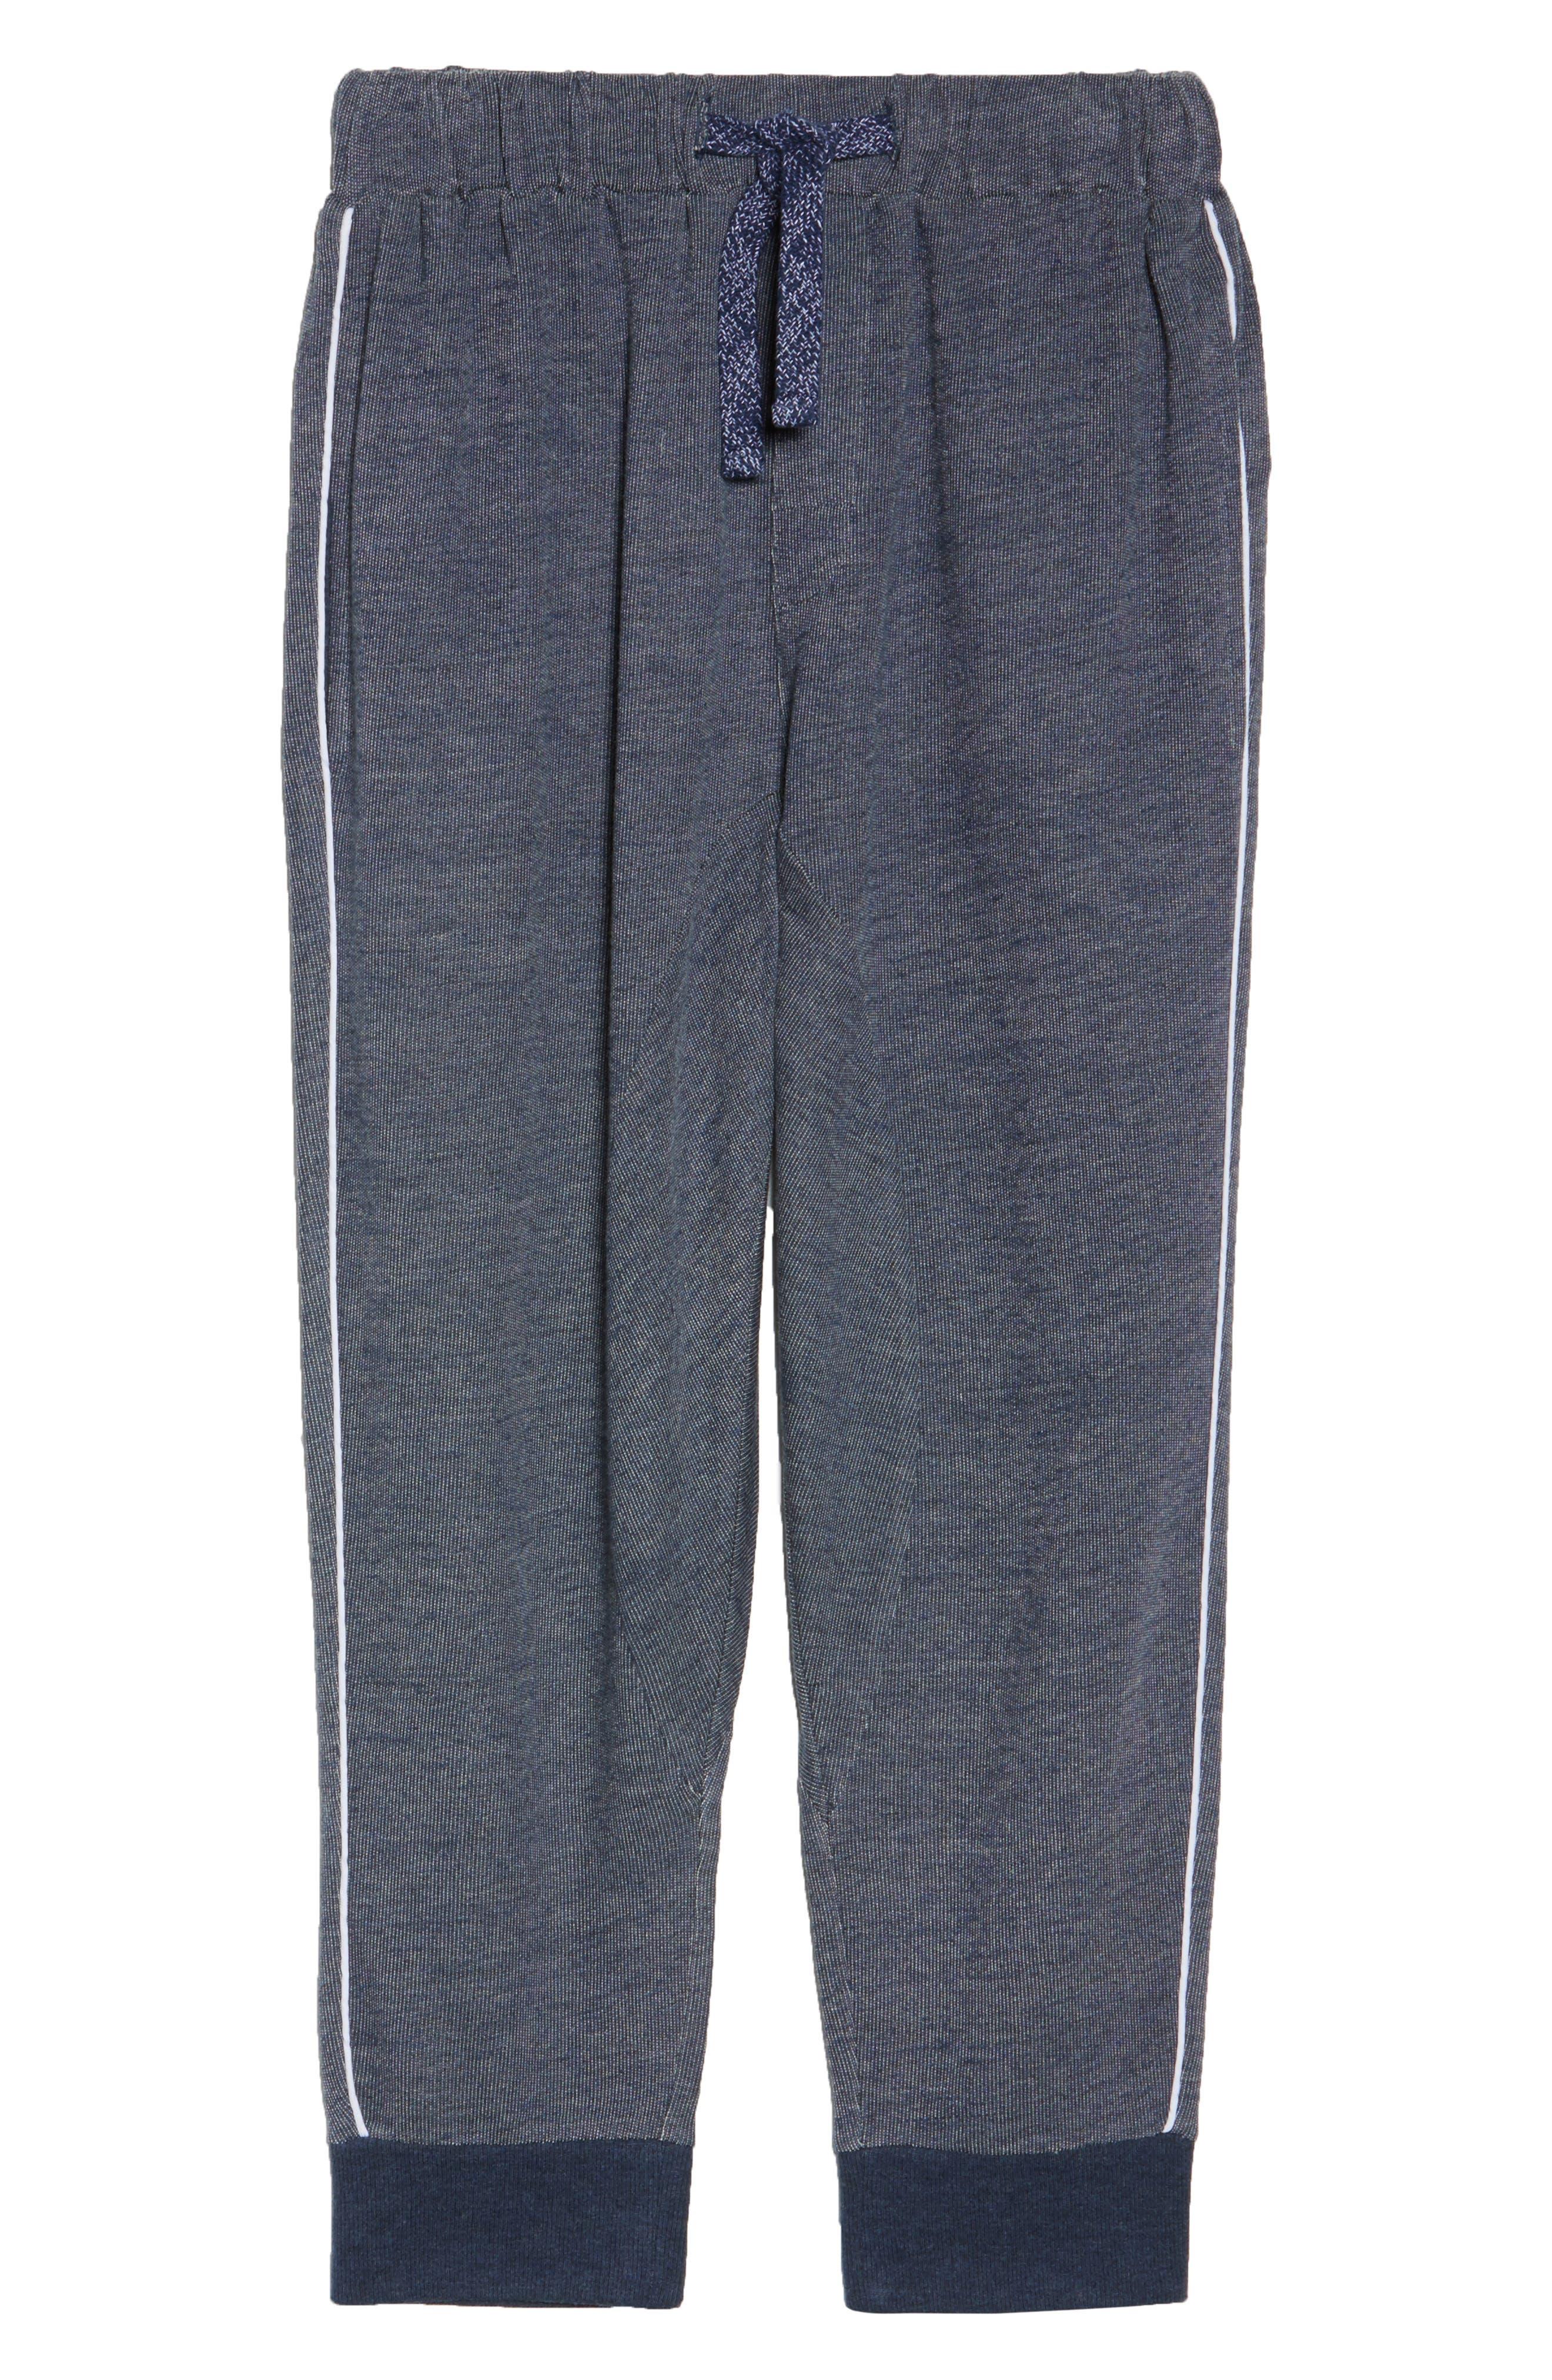 Steff Crop Lounge Pants,                             Alternate thumbnail 6, color,                             402